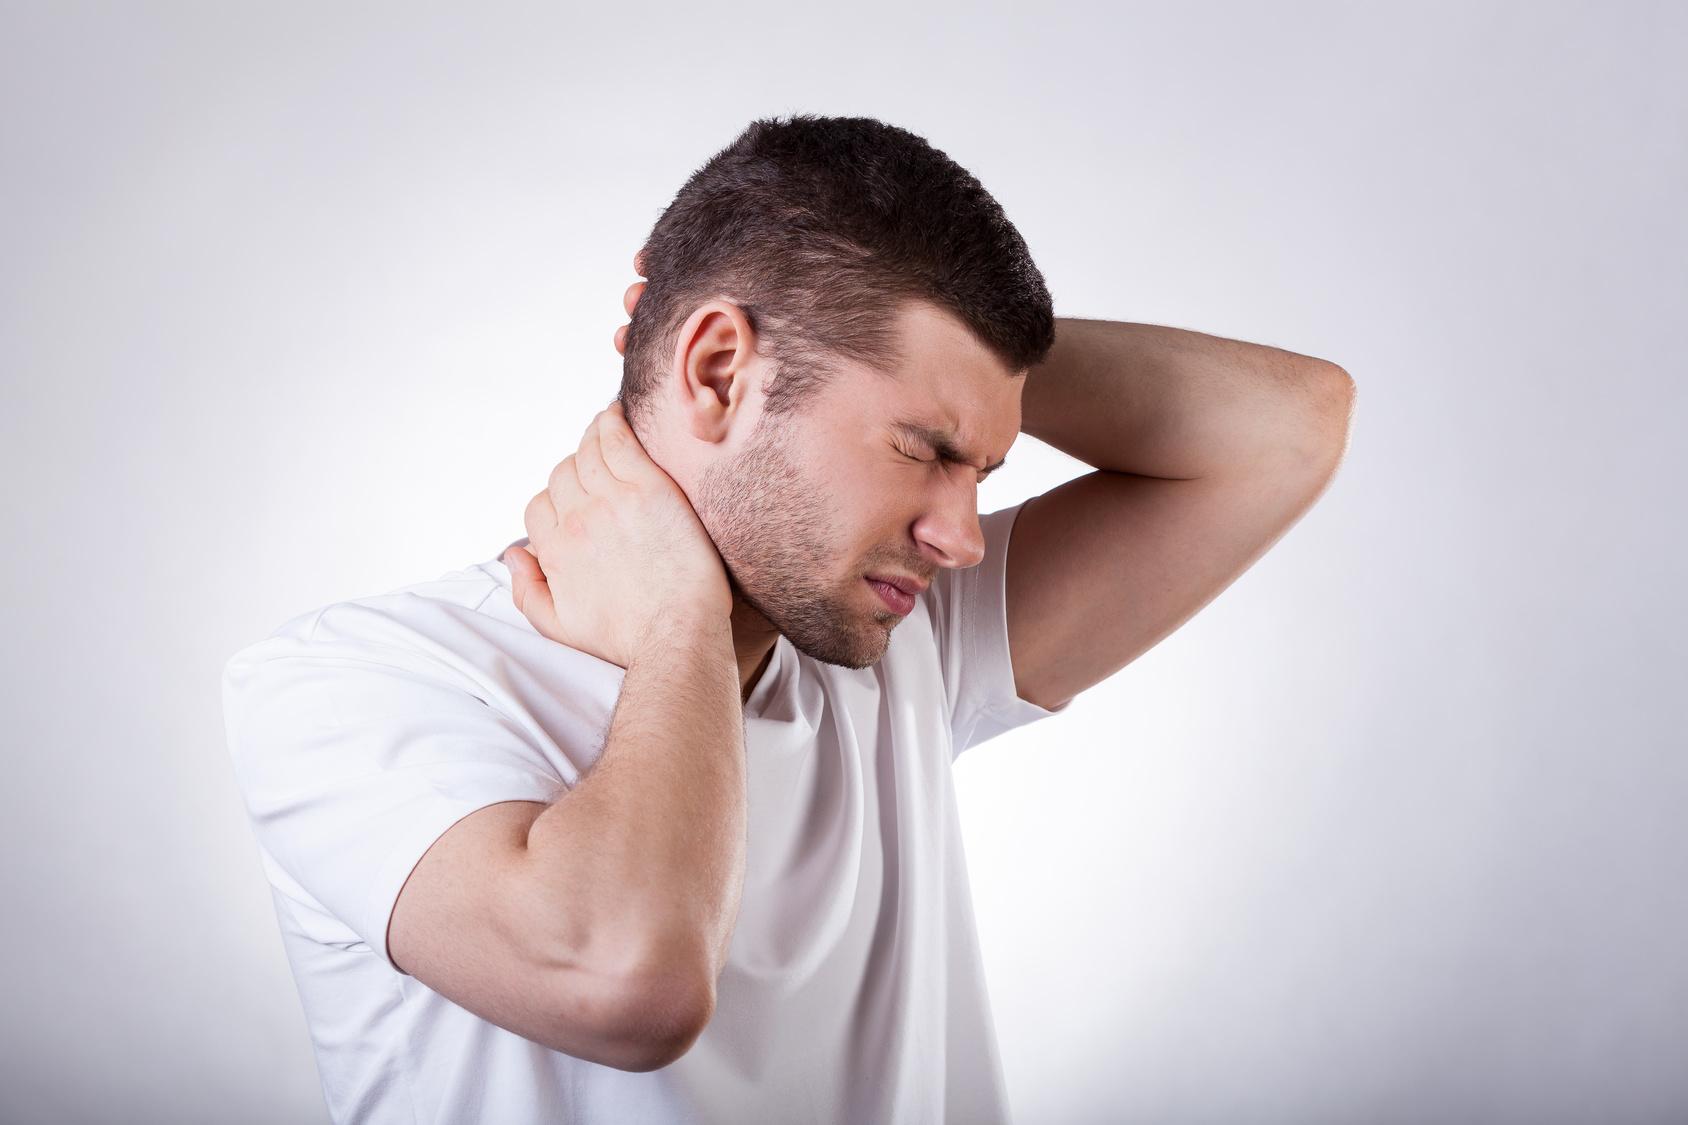 обезболивающие при болях в шее и голове